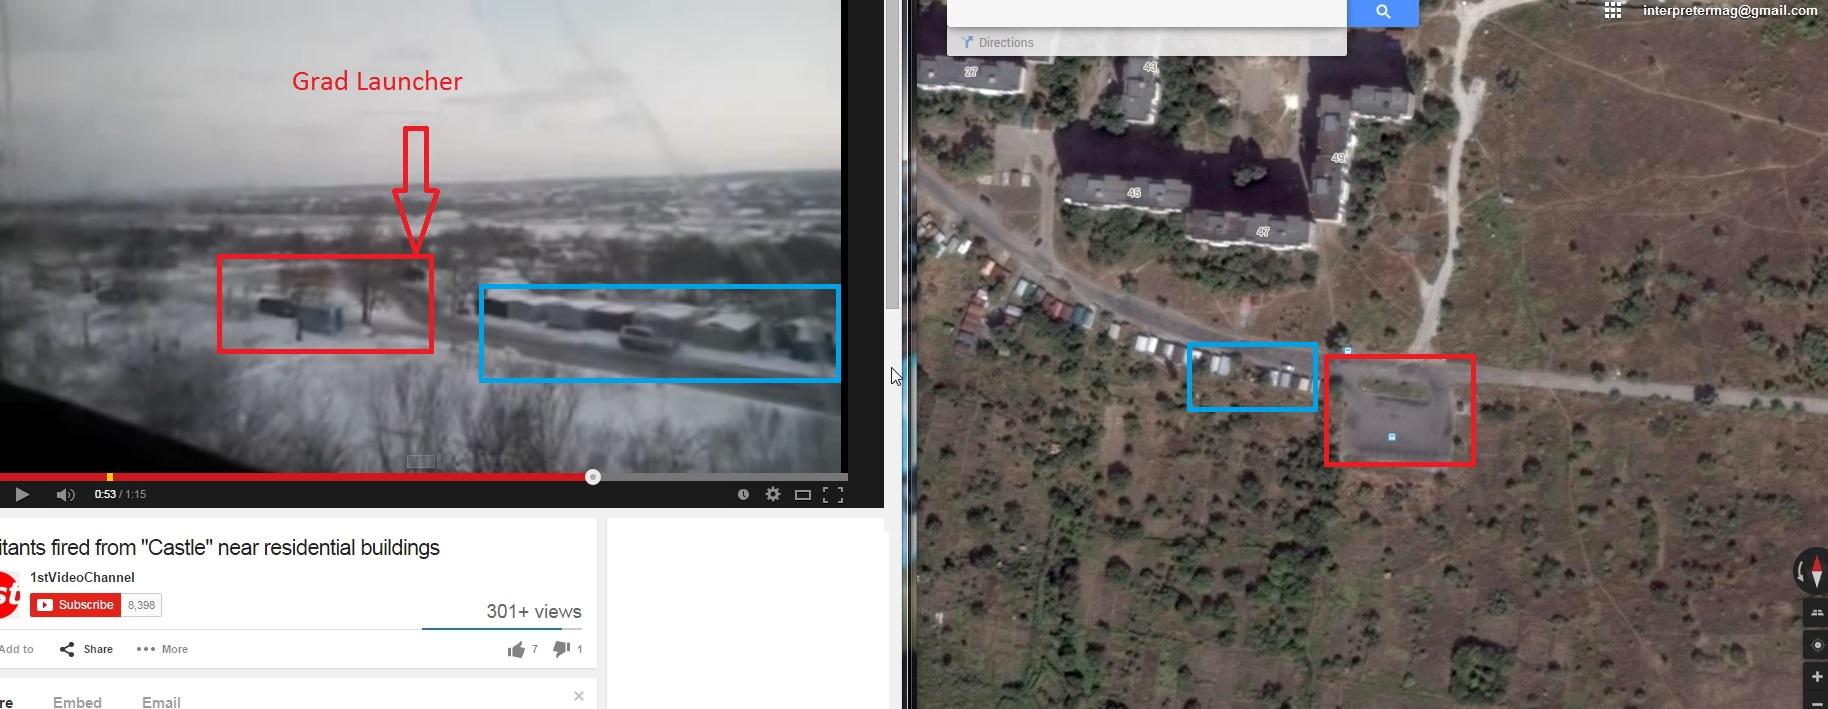 shelling-near-garages.jpg